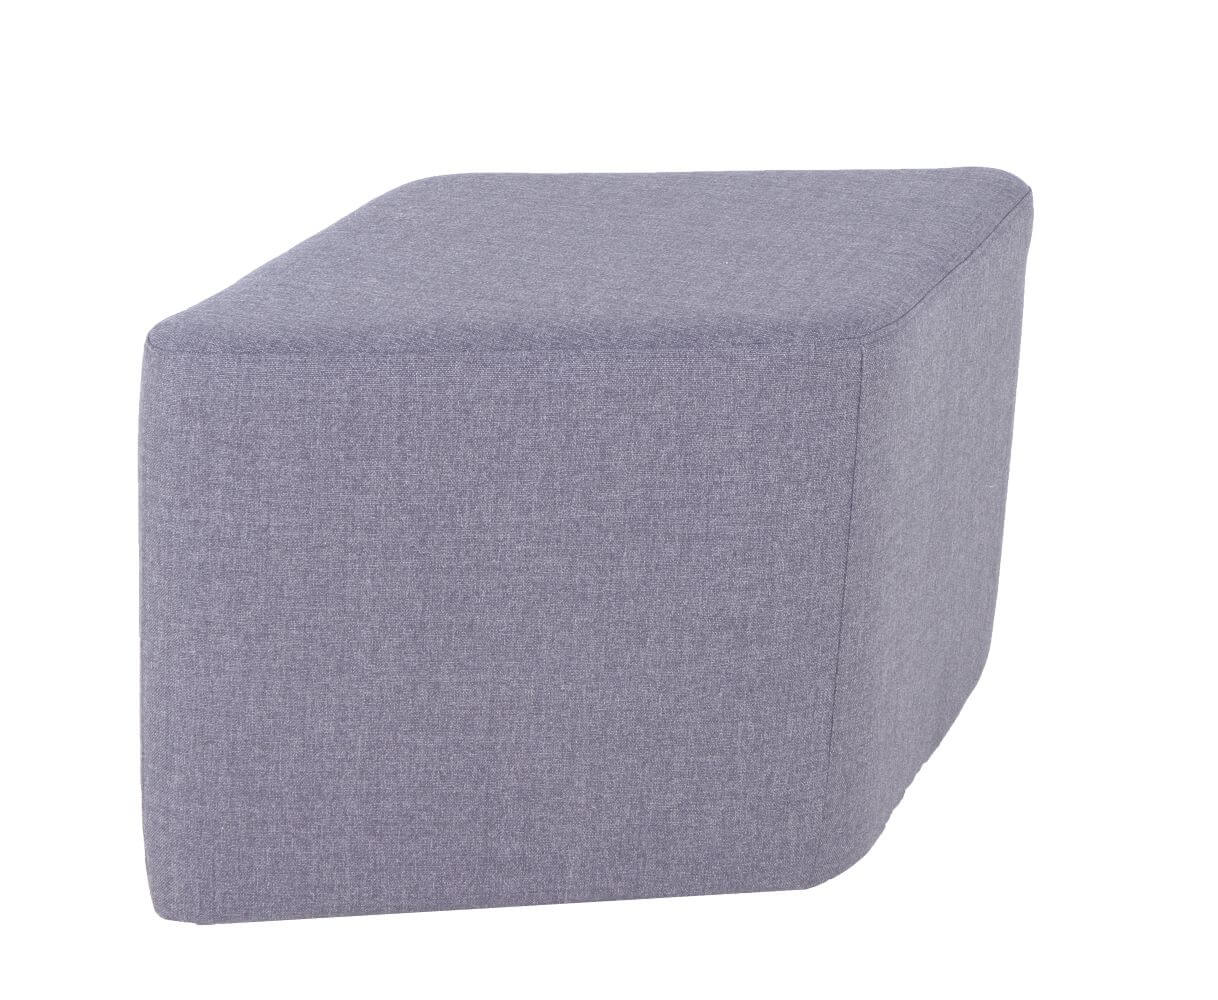 York Ottoman grey upholstery, parallelogram